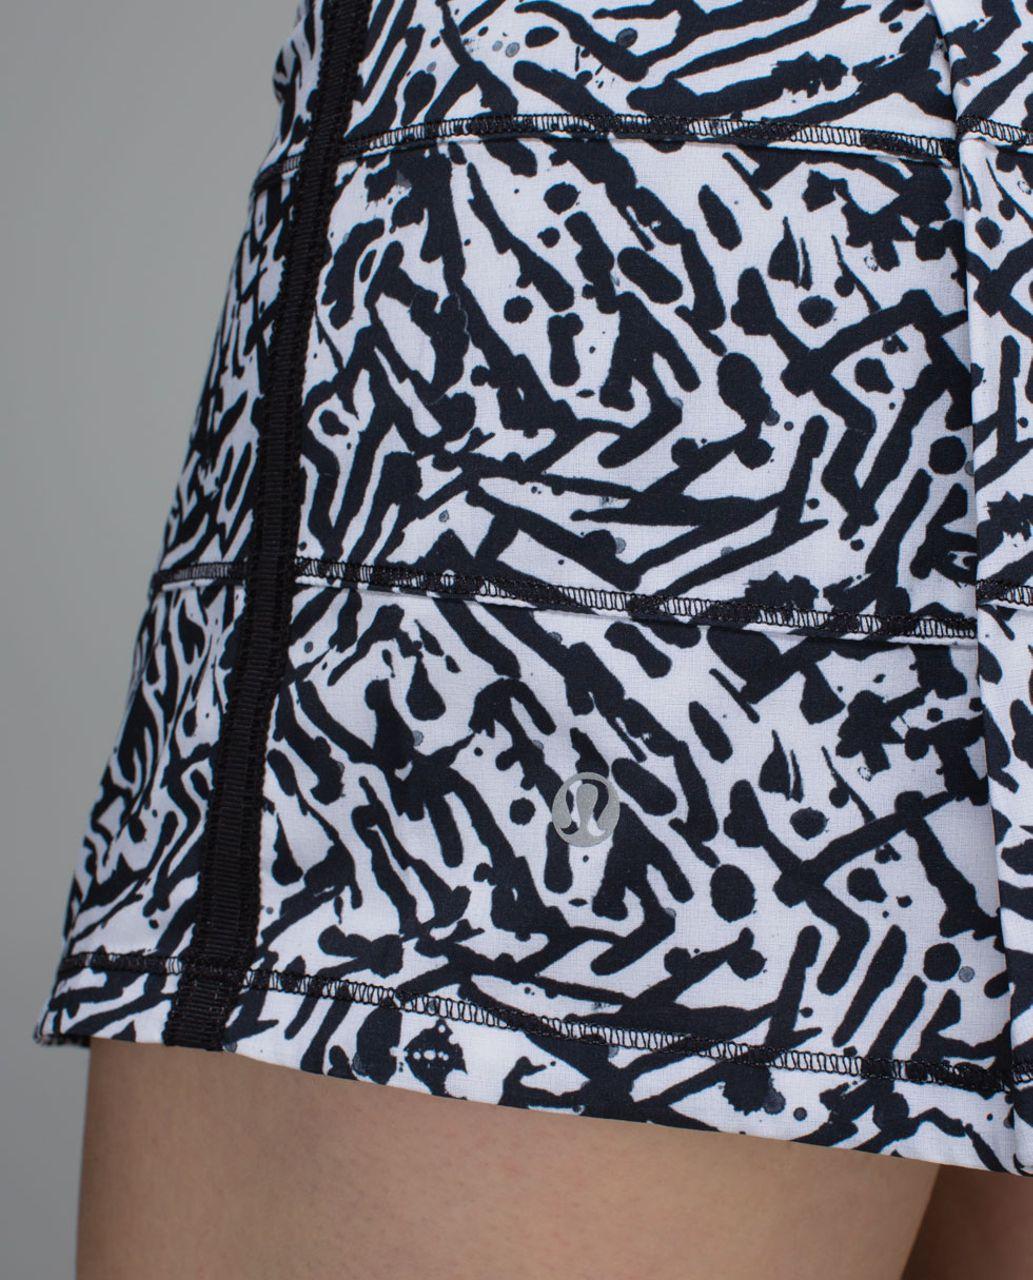 Lululemon Pace Rival Skirt II *4-way Stretch (Regular) - Brushed Animal White Black / Black